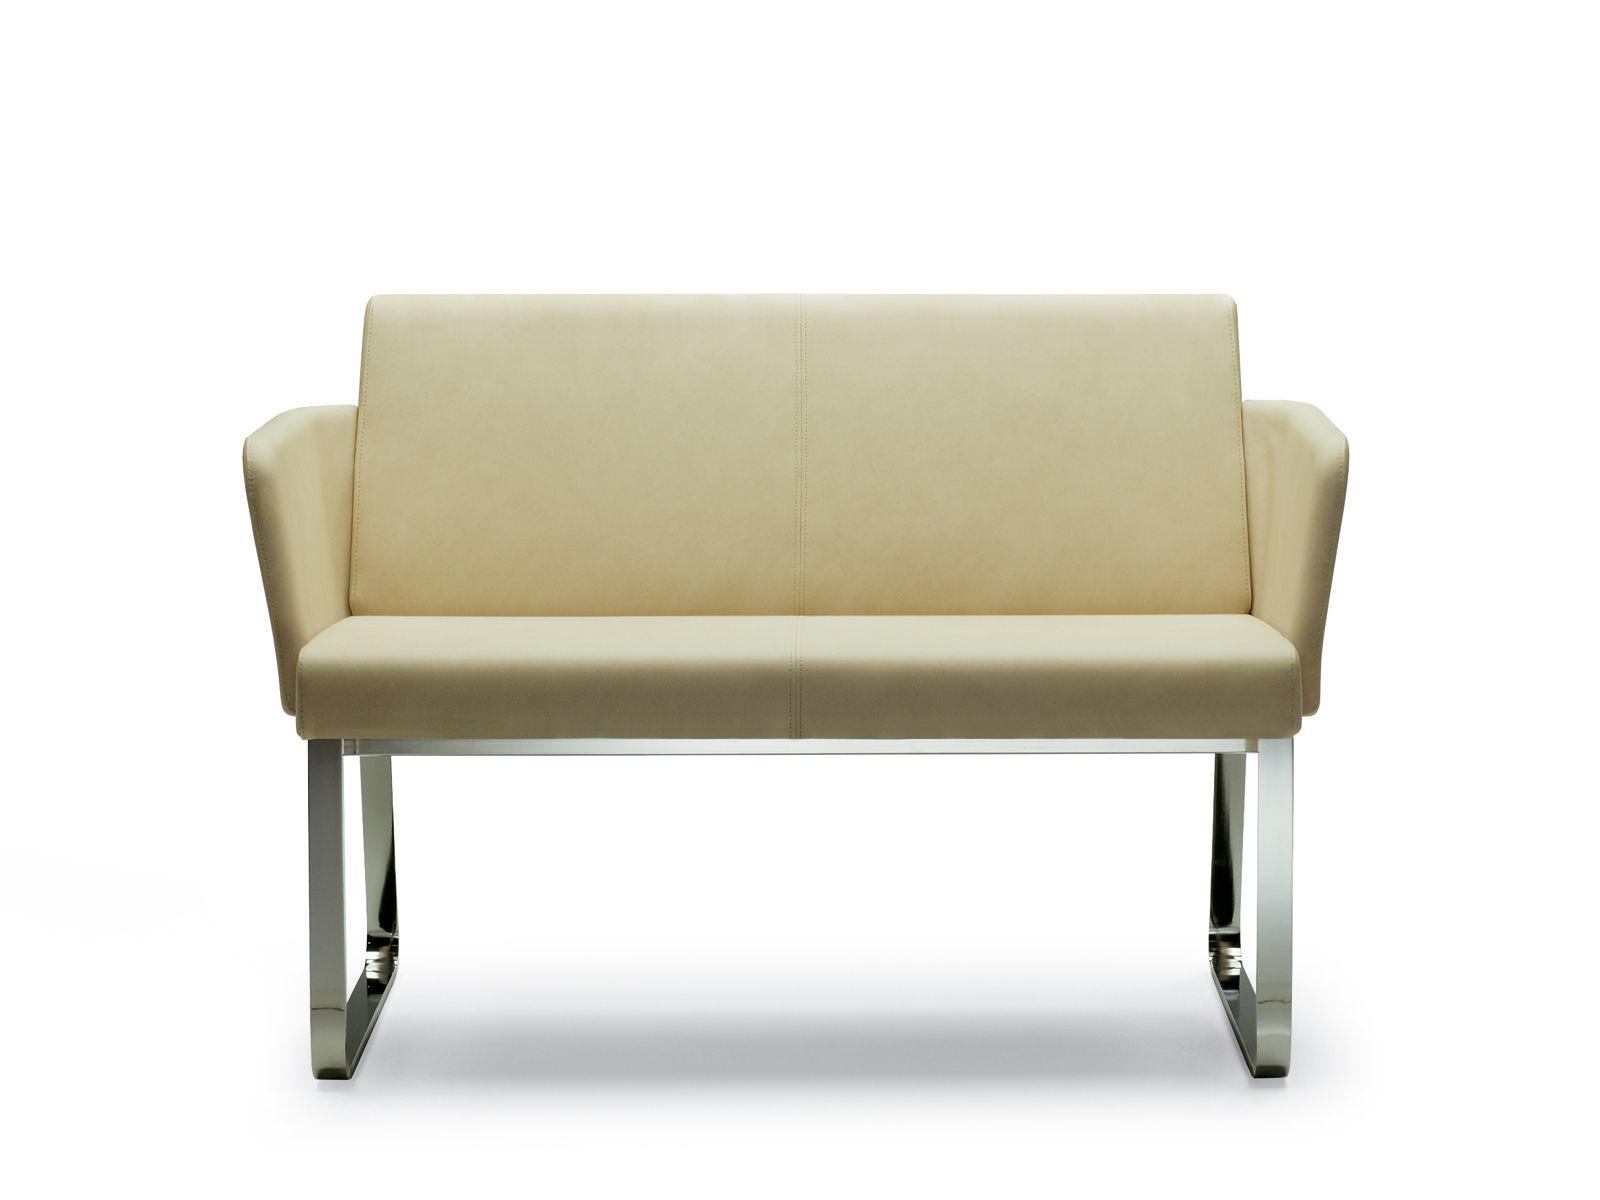 Ben sof pequeno de pele by rossin design lepper schmidt for Sofas cheslong pequenos